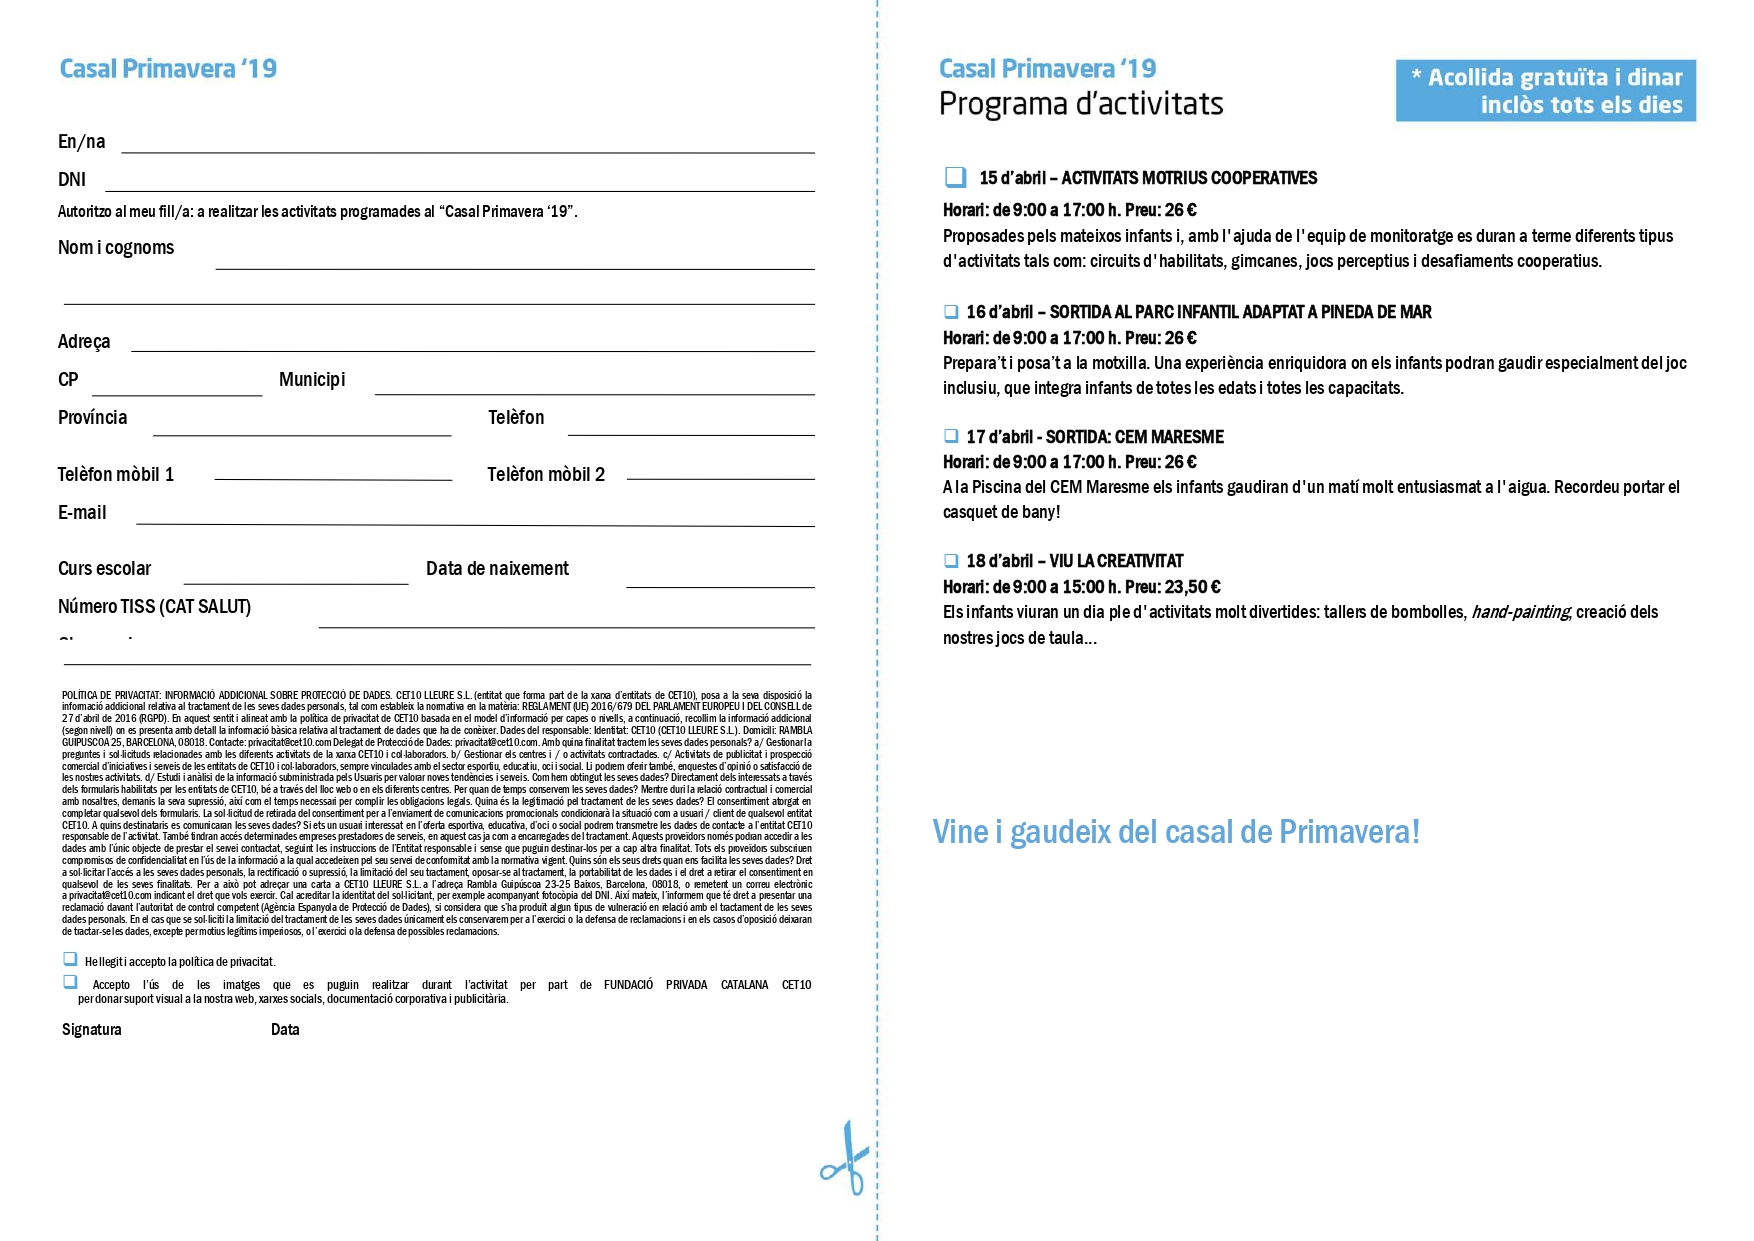 DIPTIC CASAL Primavera 19 - Antoni Brusi (2)_page-0002